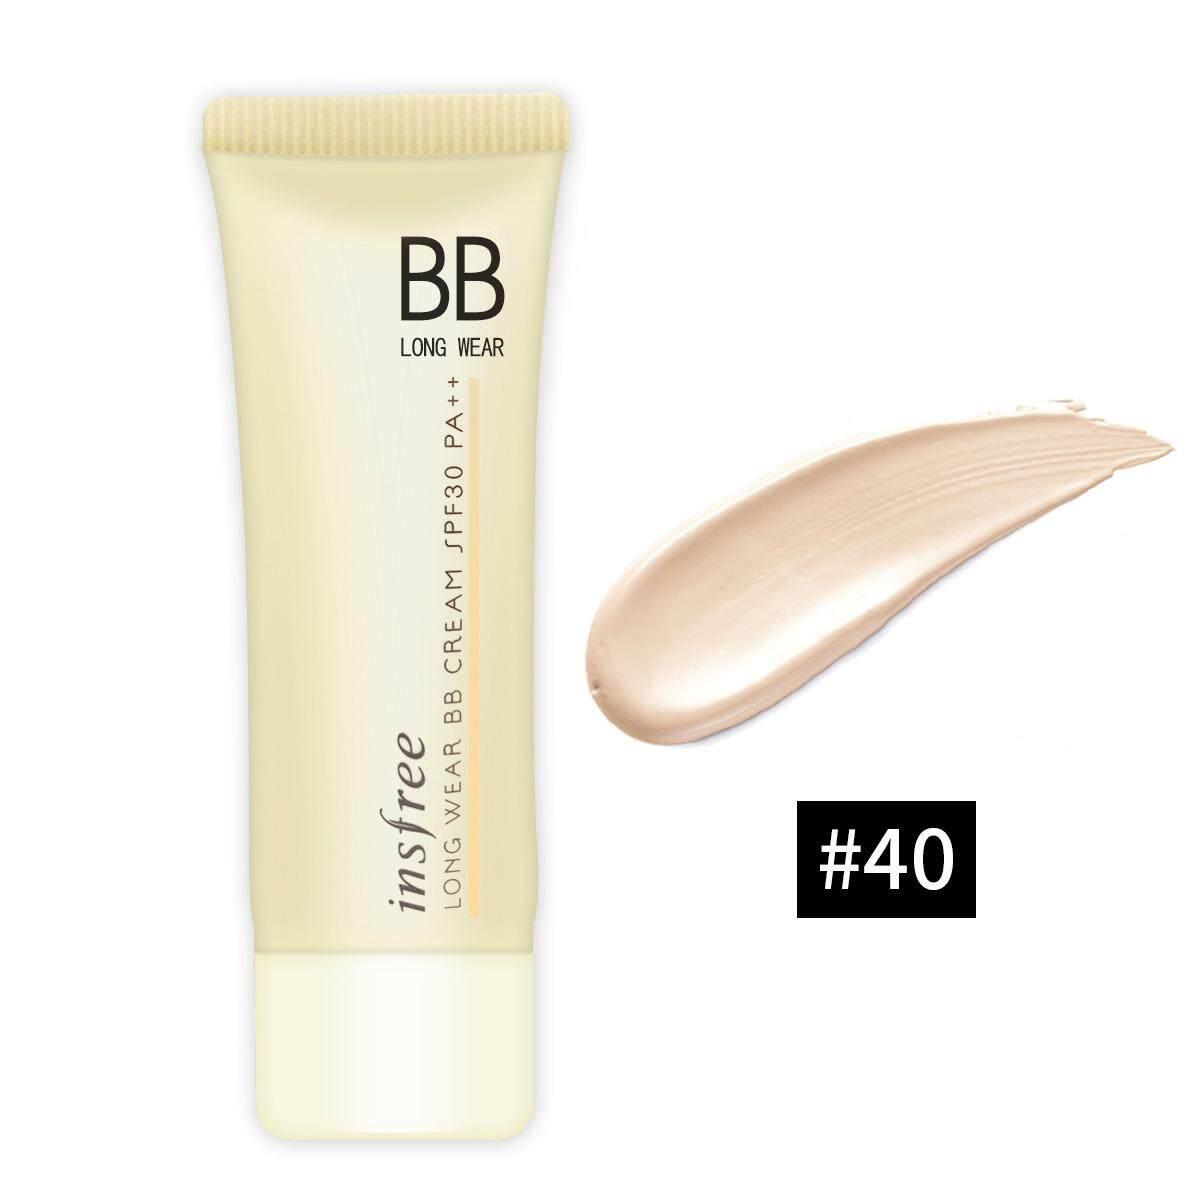 Insfree  In A1  Repair Bb Cream Isolation Concealer Brightening Nude Makeup Cream -Cokkicosmtic ครีมบำรุงผิว  ครีมบีบี  คอนซีลเลอร์แต่งหน้า.